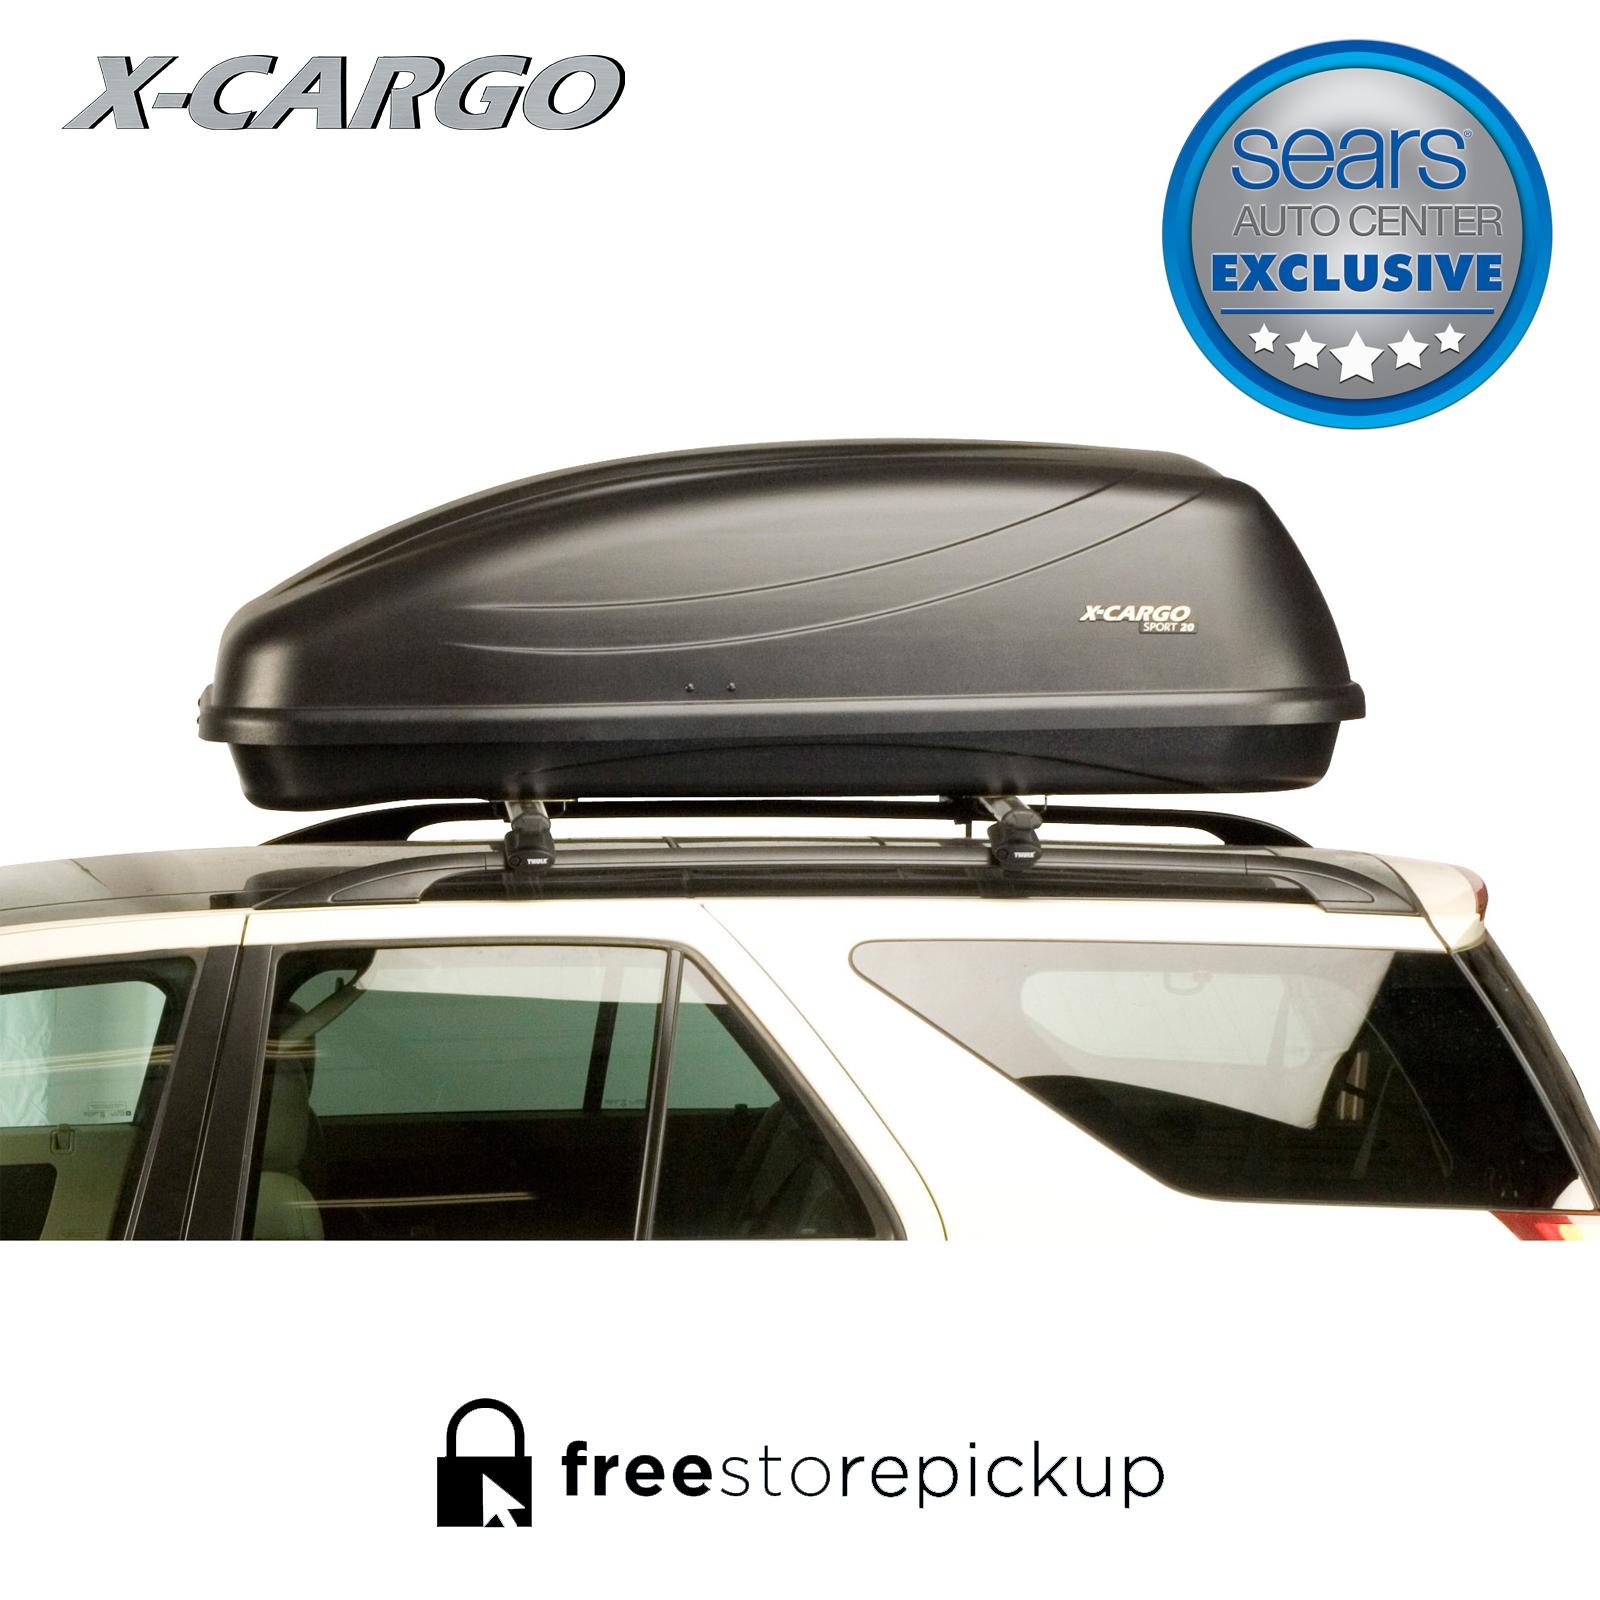 x cargo 20 cu ft car top carrier black rh sears com Sears Sport 20 X-Cargo Sport 2 0